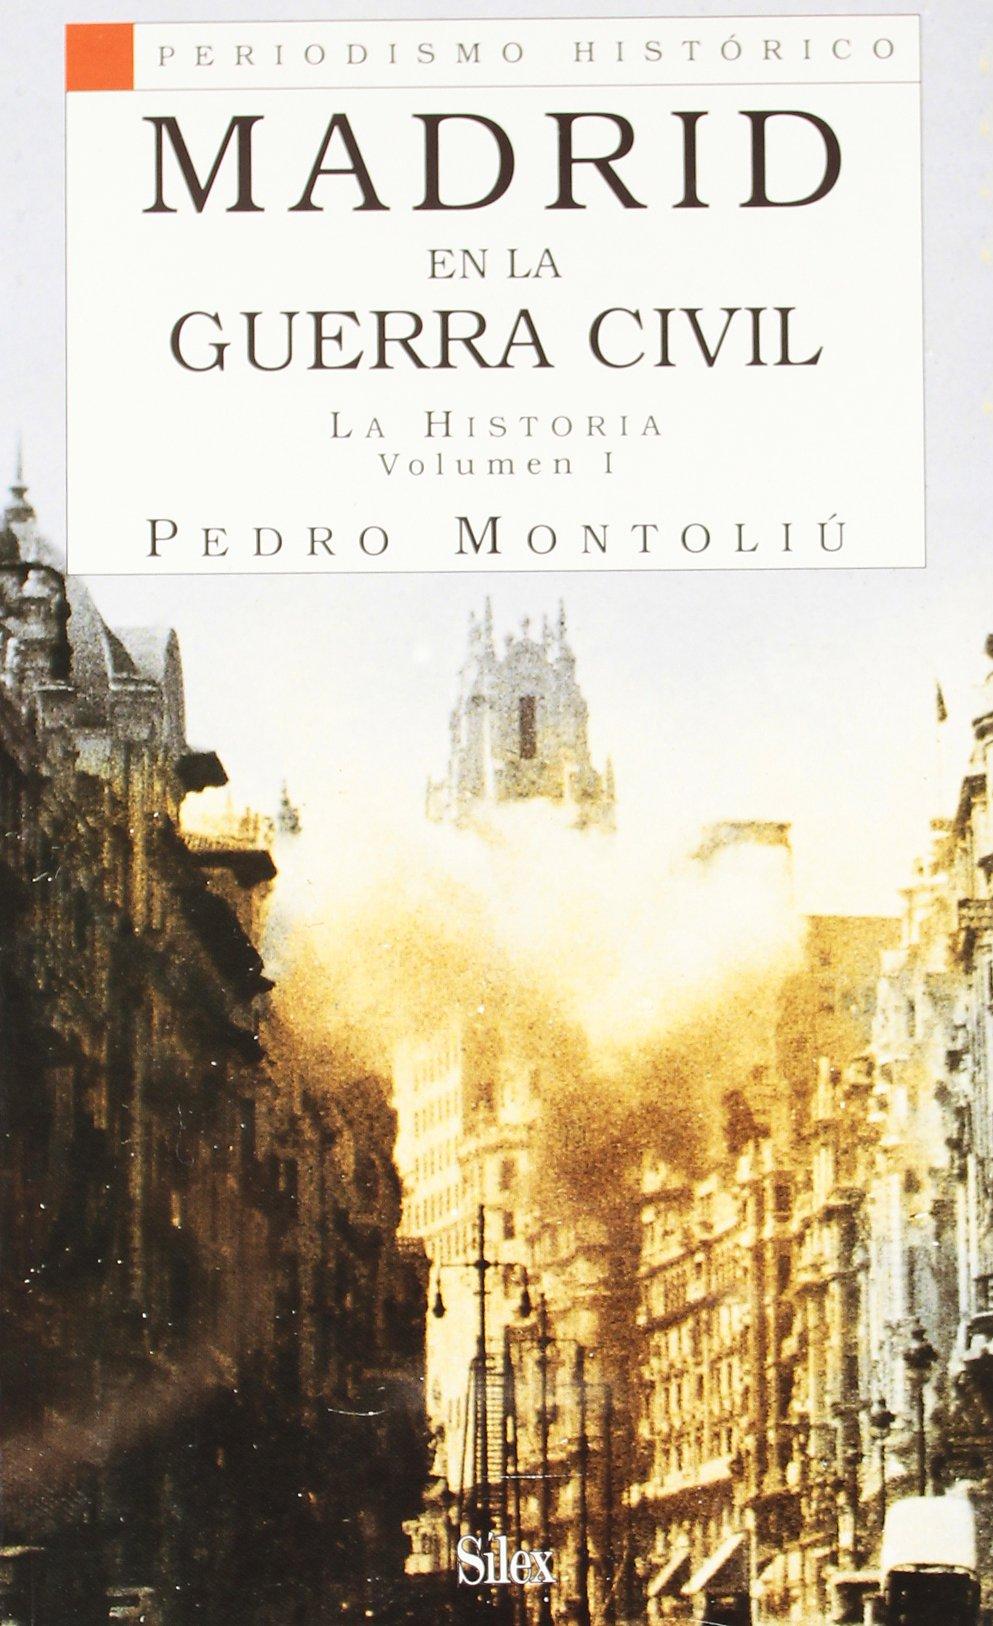 Madrid en la Guerra Civil I: La historia Periodismo Histórico: Amazon.es: Montoliú Camps, Pedro: Libros